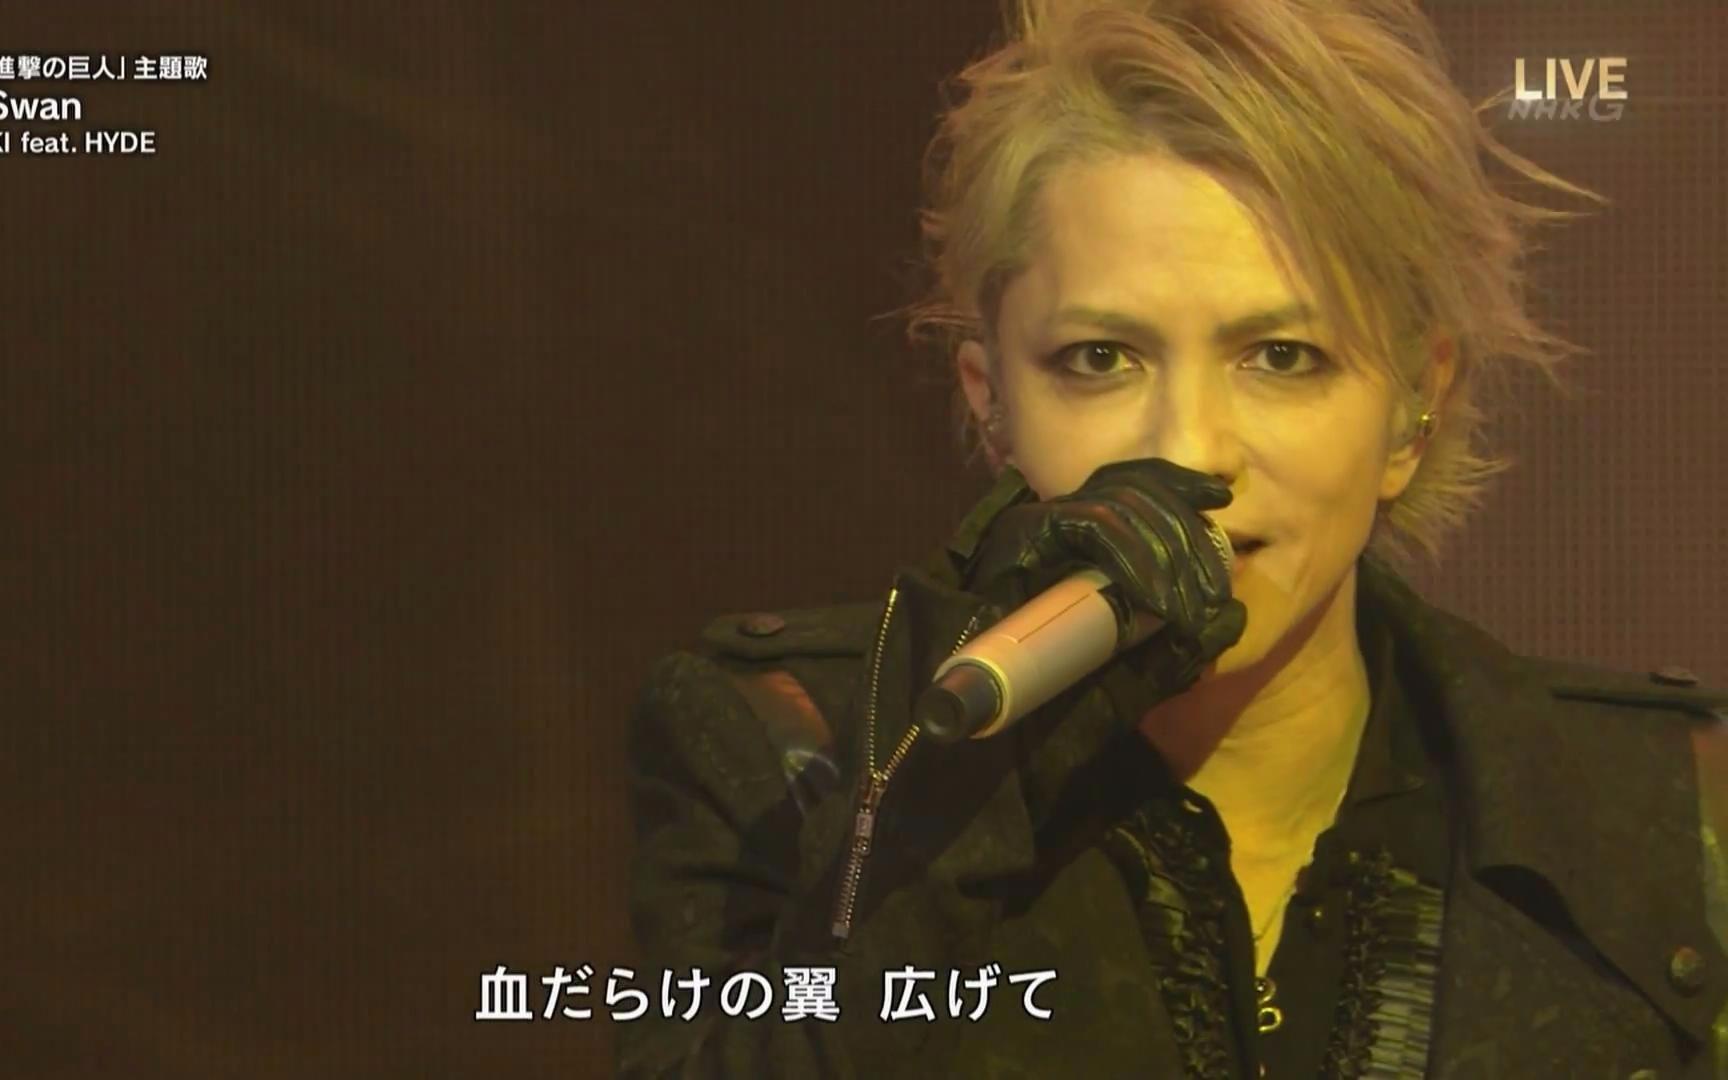 【HYDE】Red Swan(第69回NHK紅白歌合戦)_嗶哩嗶哩 (゜-゜)つロ 干杯~-bilibili